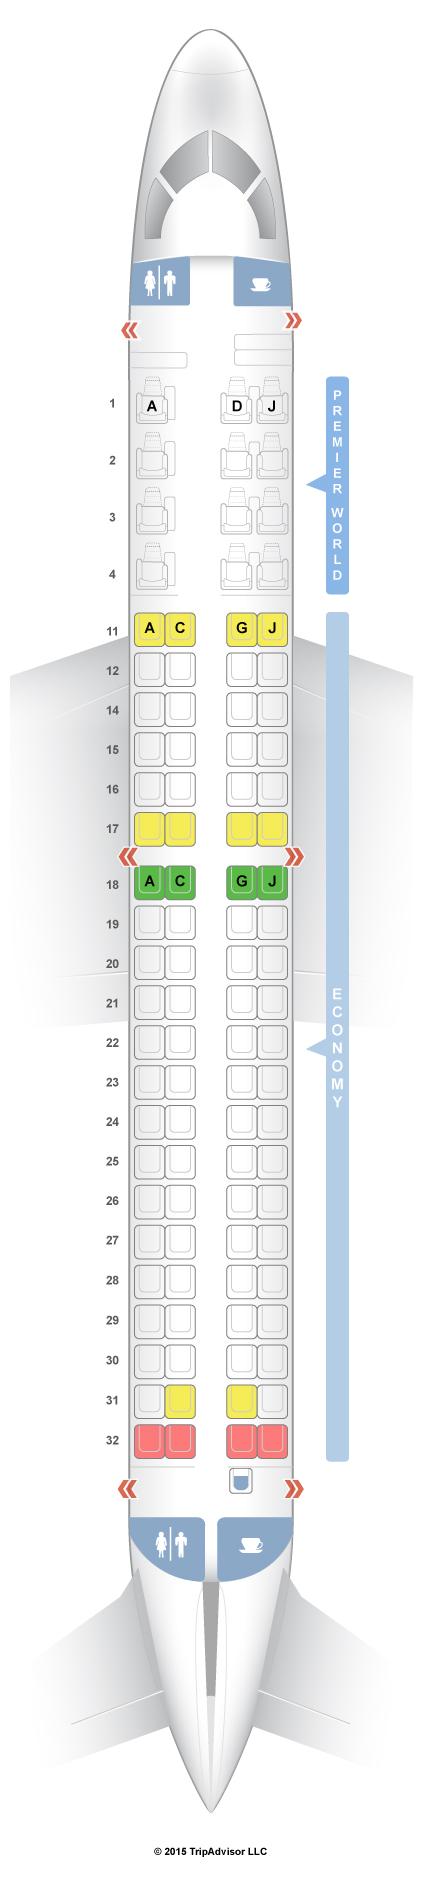 SeatGuru Seat Map Kenya Airways on